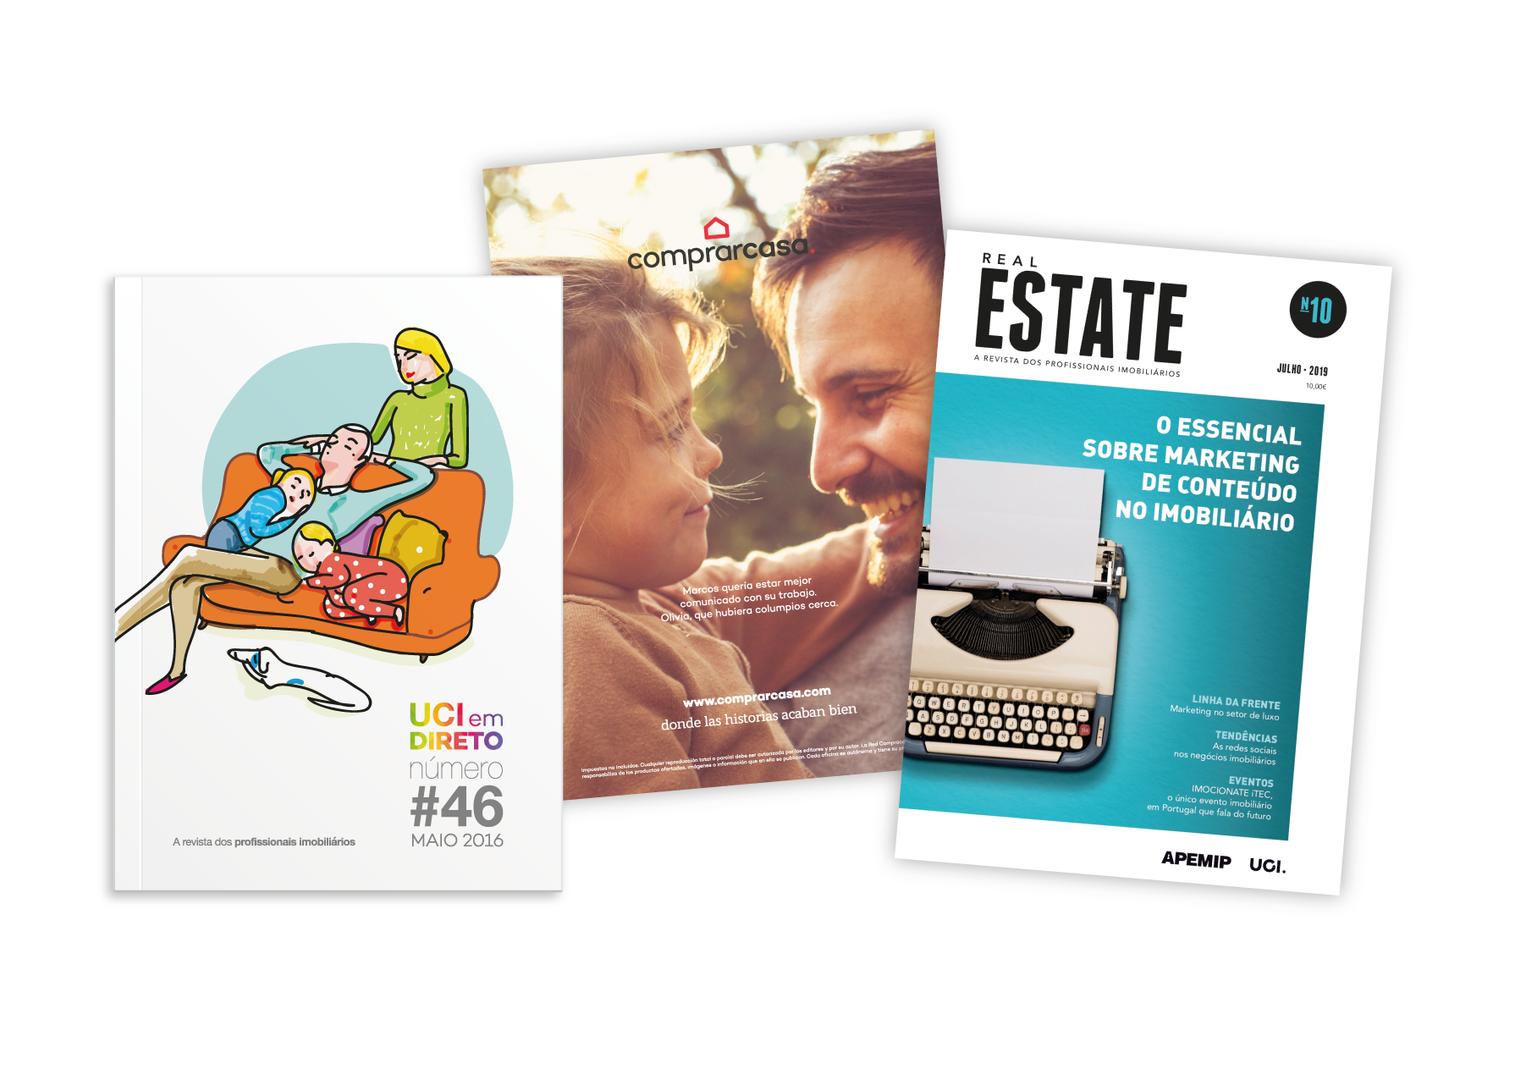 UCI em Direto, Revista Comprarcasa, Revista Real Estate